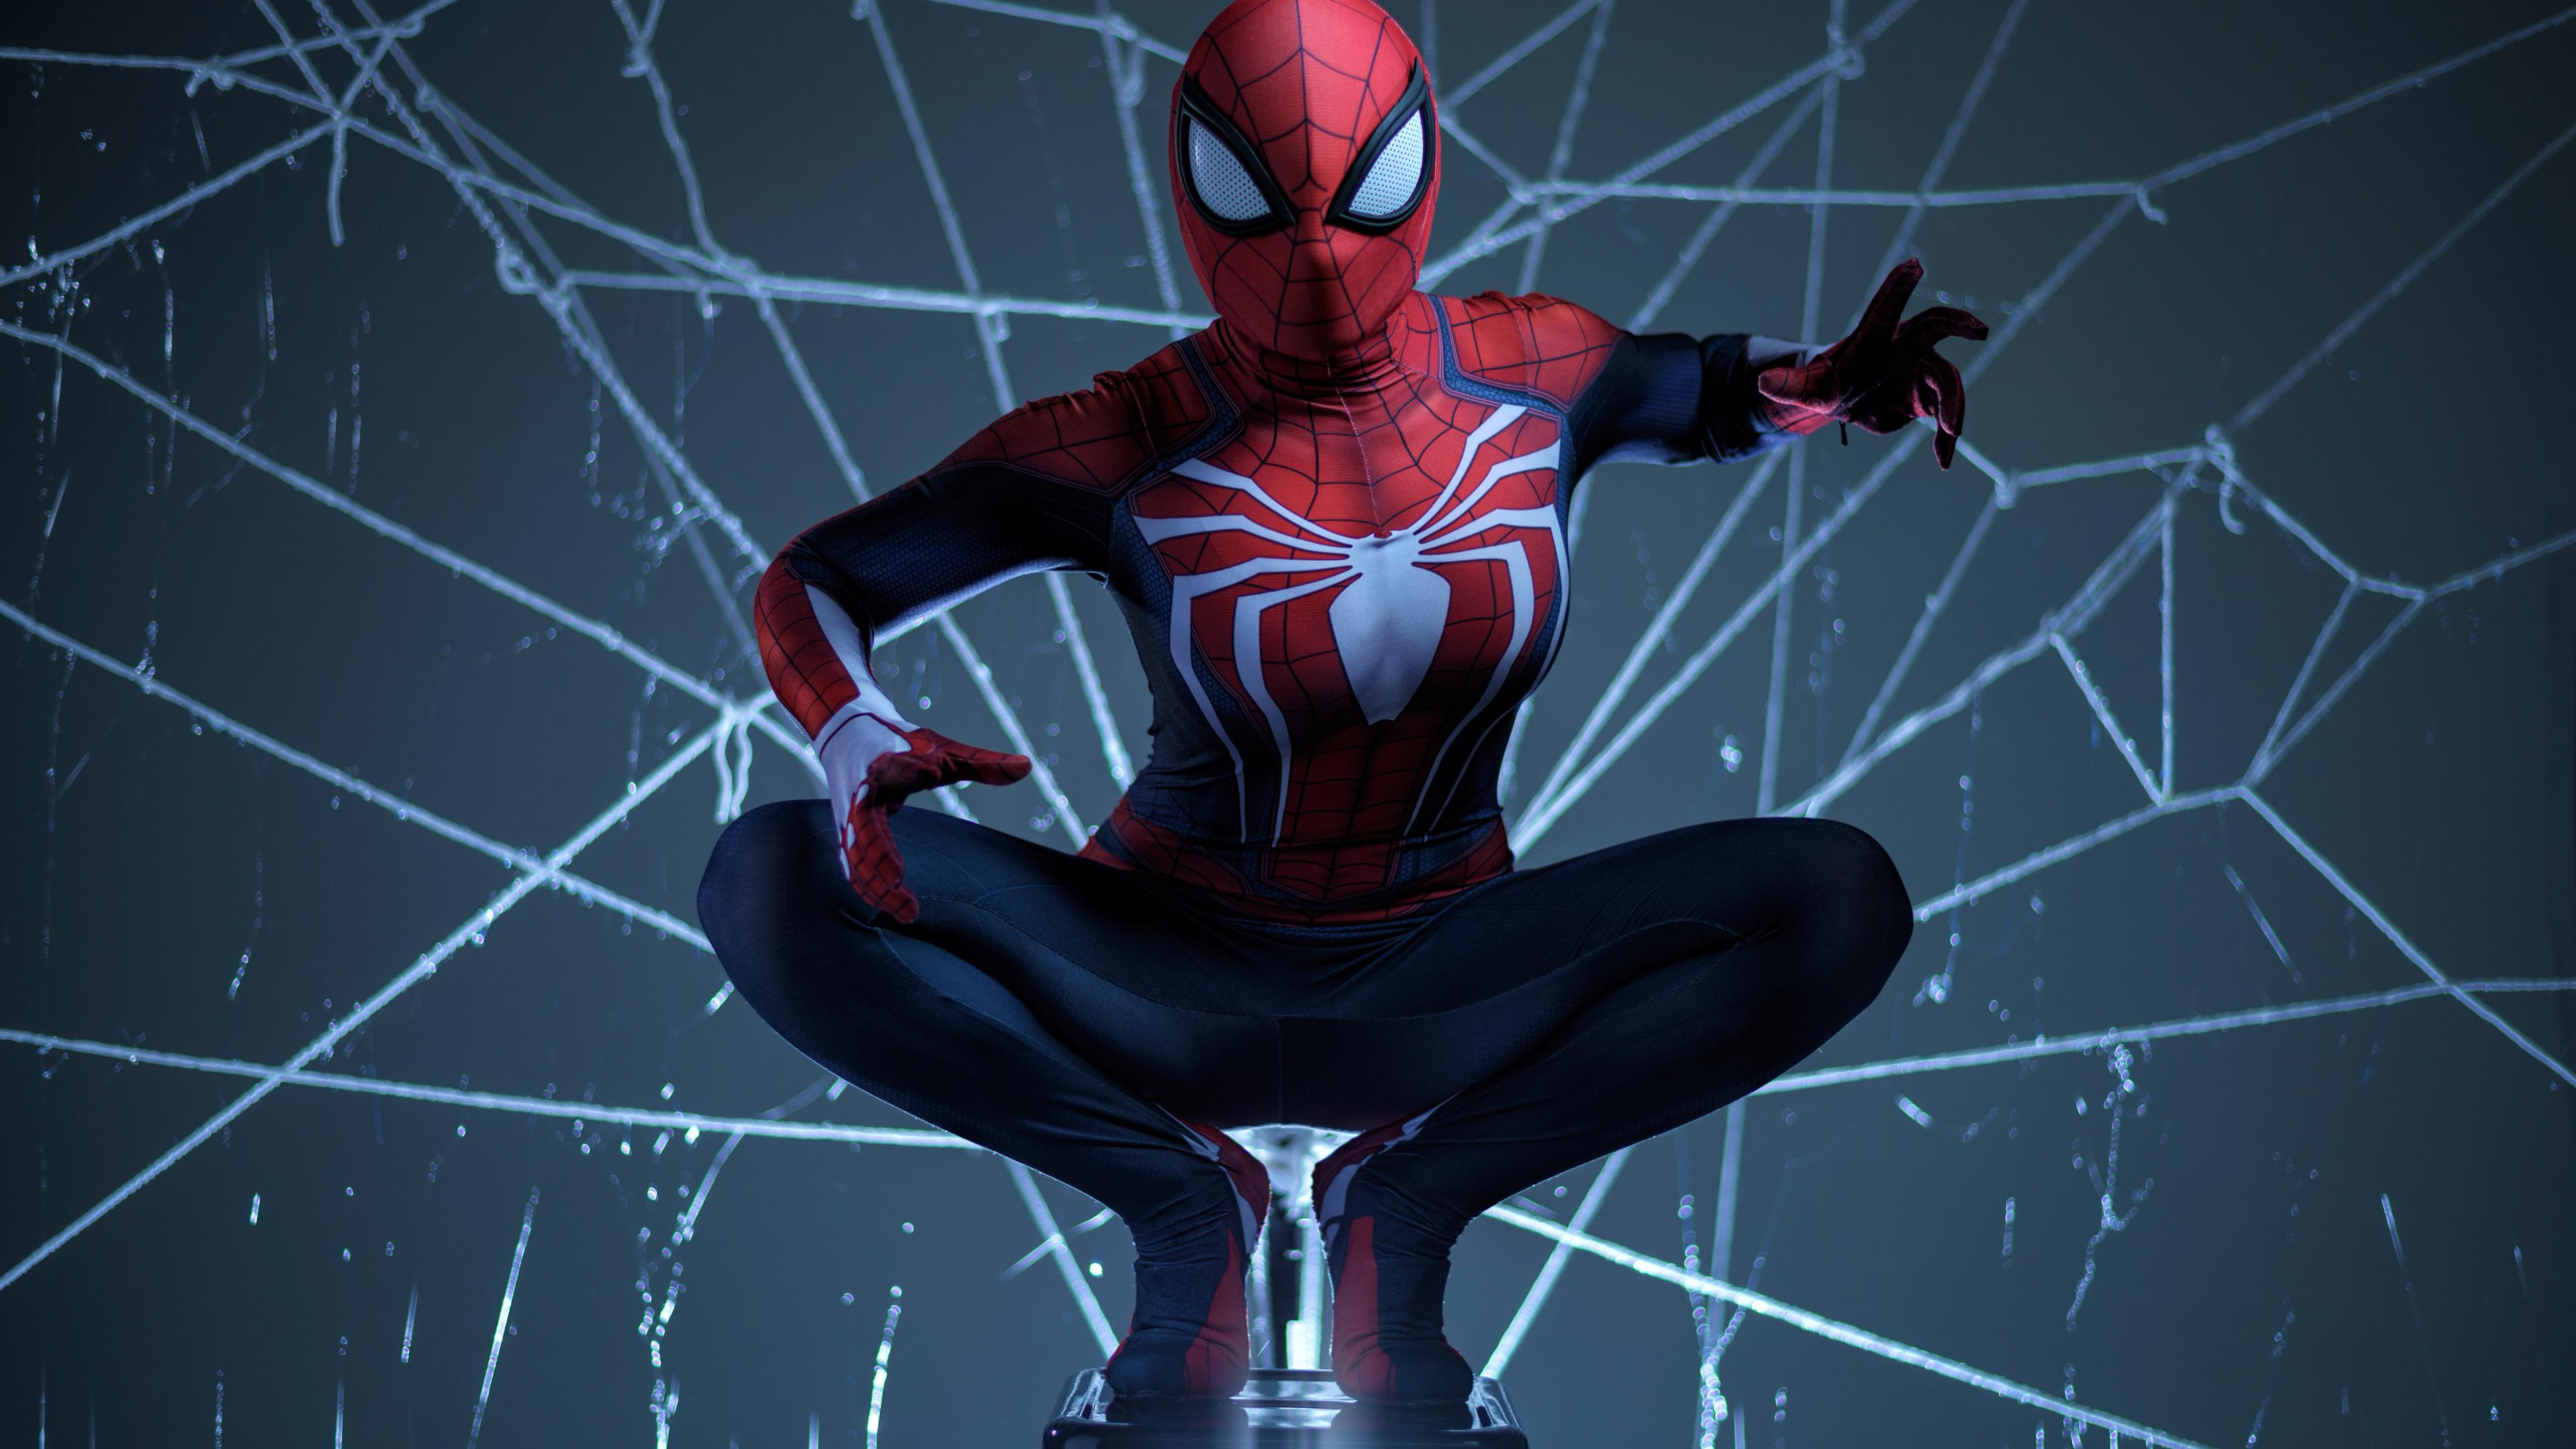 spiderman cosplay 8k 1536523735 - Spiderman Cosplay 8k - superheroes wallpapers, spiderman wallpapers, hd-wallpapers, flickr wallpapers, cosplay wallpapers, artist wallpapers, 8k wallpapers, 5k wallpapers, 4k-wallpapers